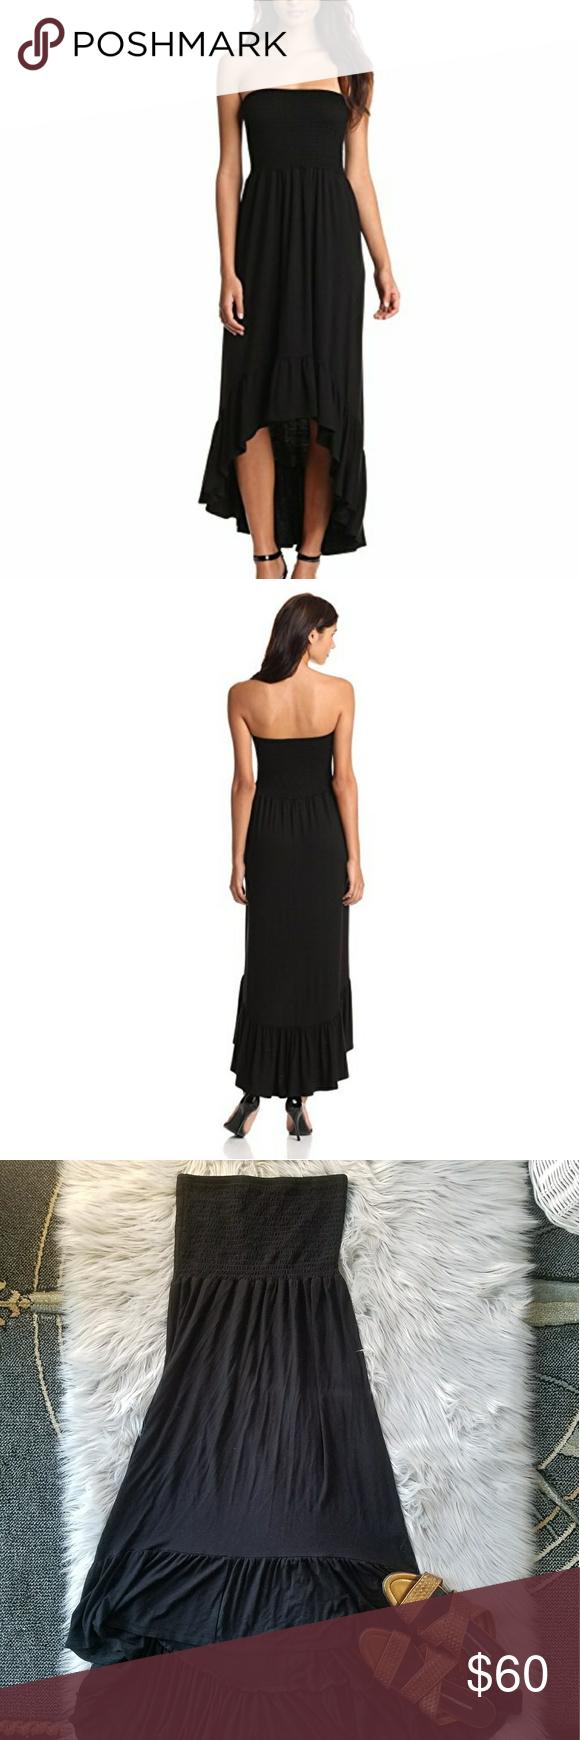 Karen Kane Bandeau Maxi Dress Bandeau Maxi Dress Dresses Karen Kane Dress [ 1740 x 580 Pixel ]